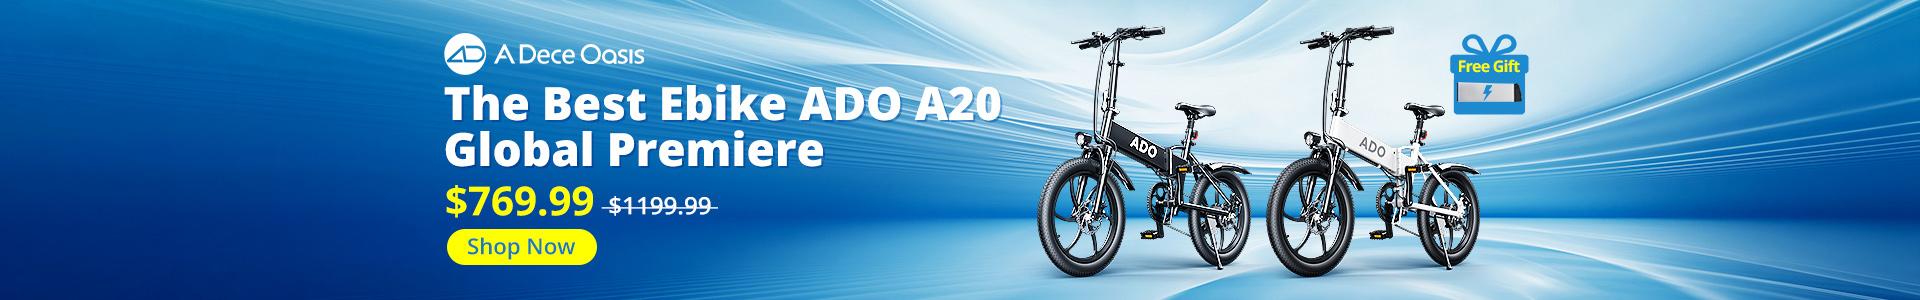 The amazing bike ADO A20